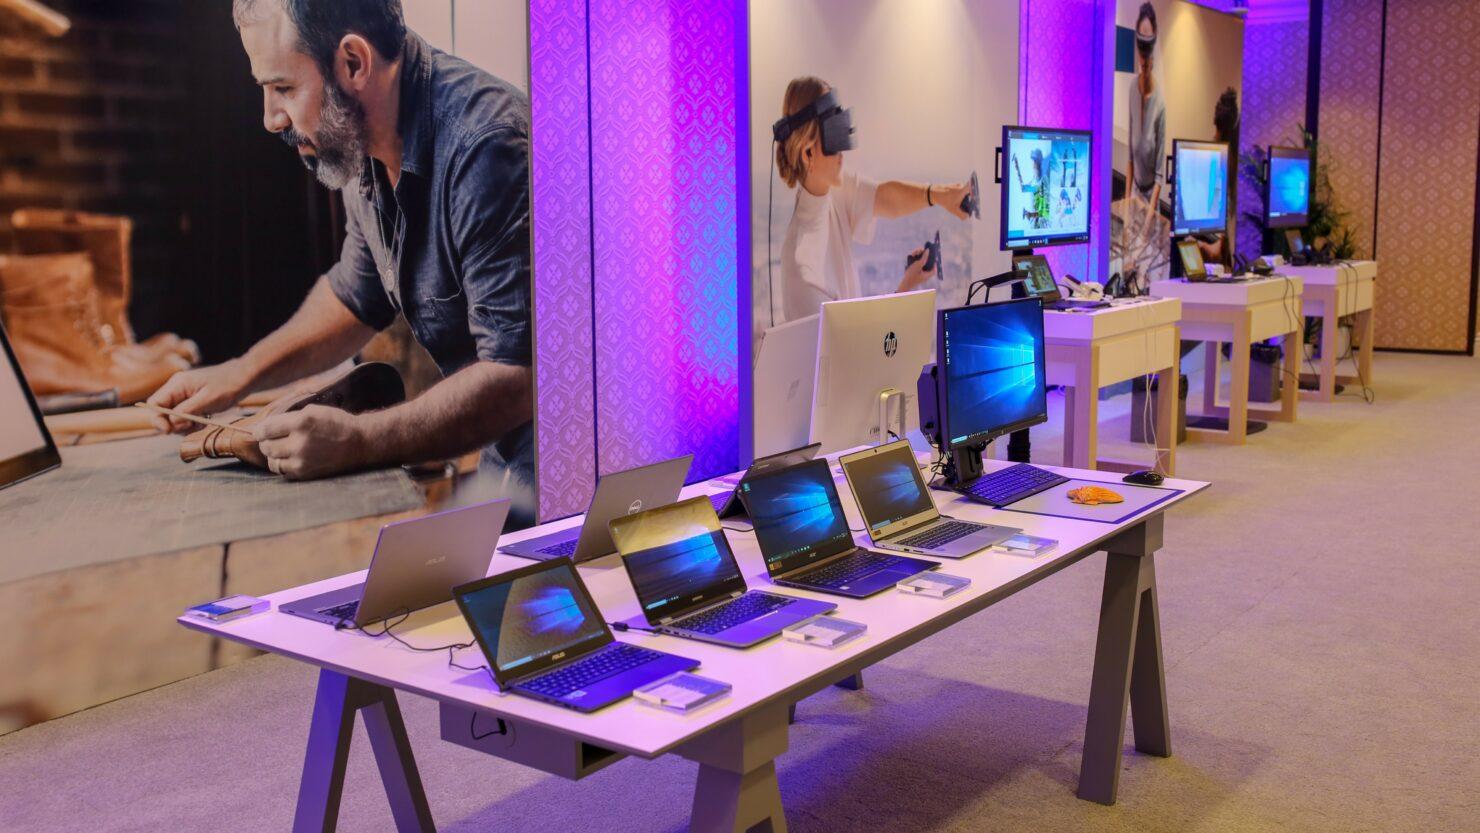 Windows 10 cumulative updates windows 10 1903 install Windows 10 may 2019 update